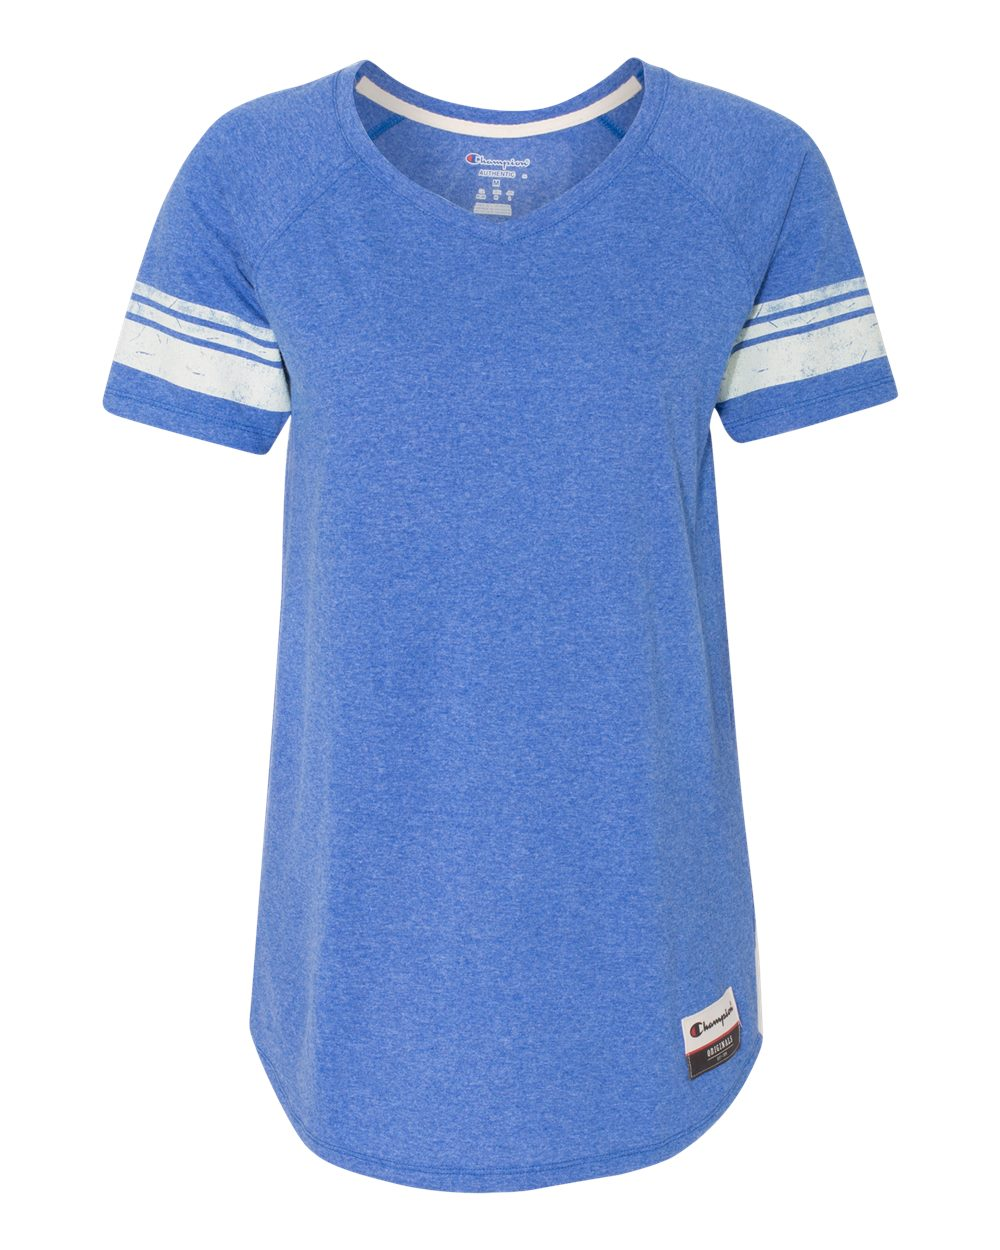 Bowling Shirts For Sale Custom Bowling Shirts Bowling Shirts